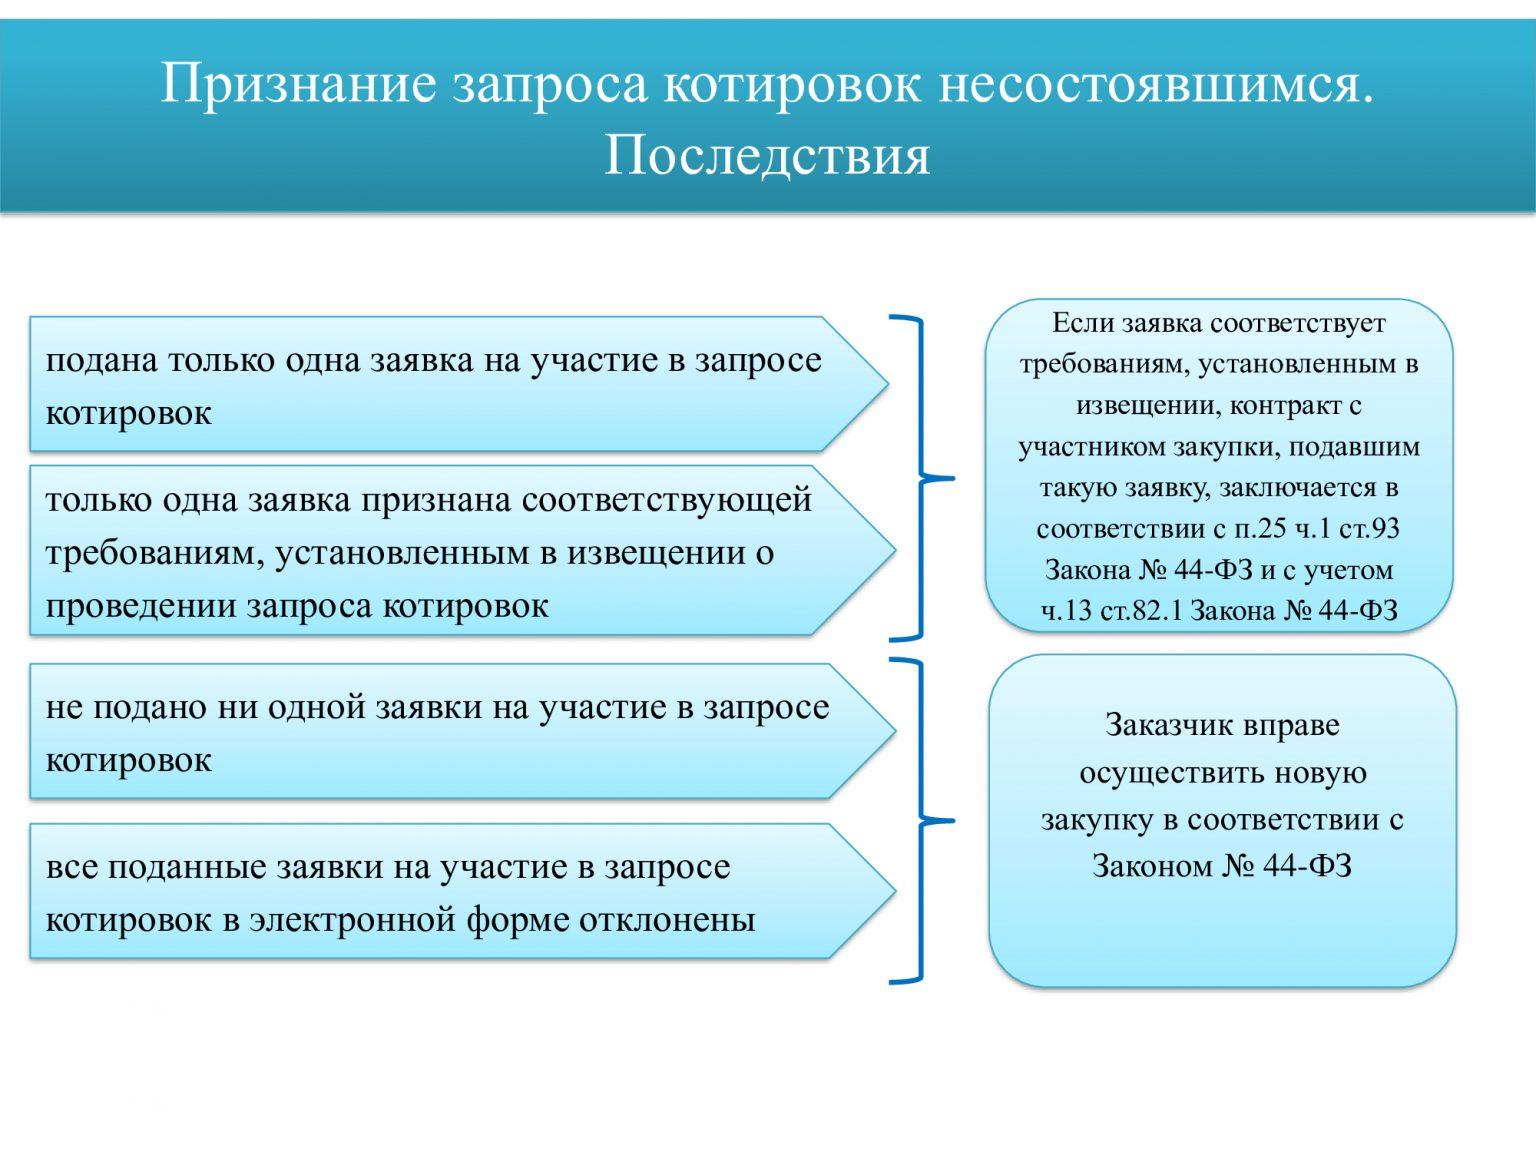 538122ea1ccdb7cea62c6beacce69309-9